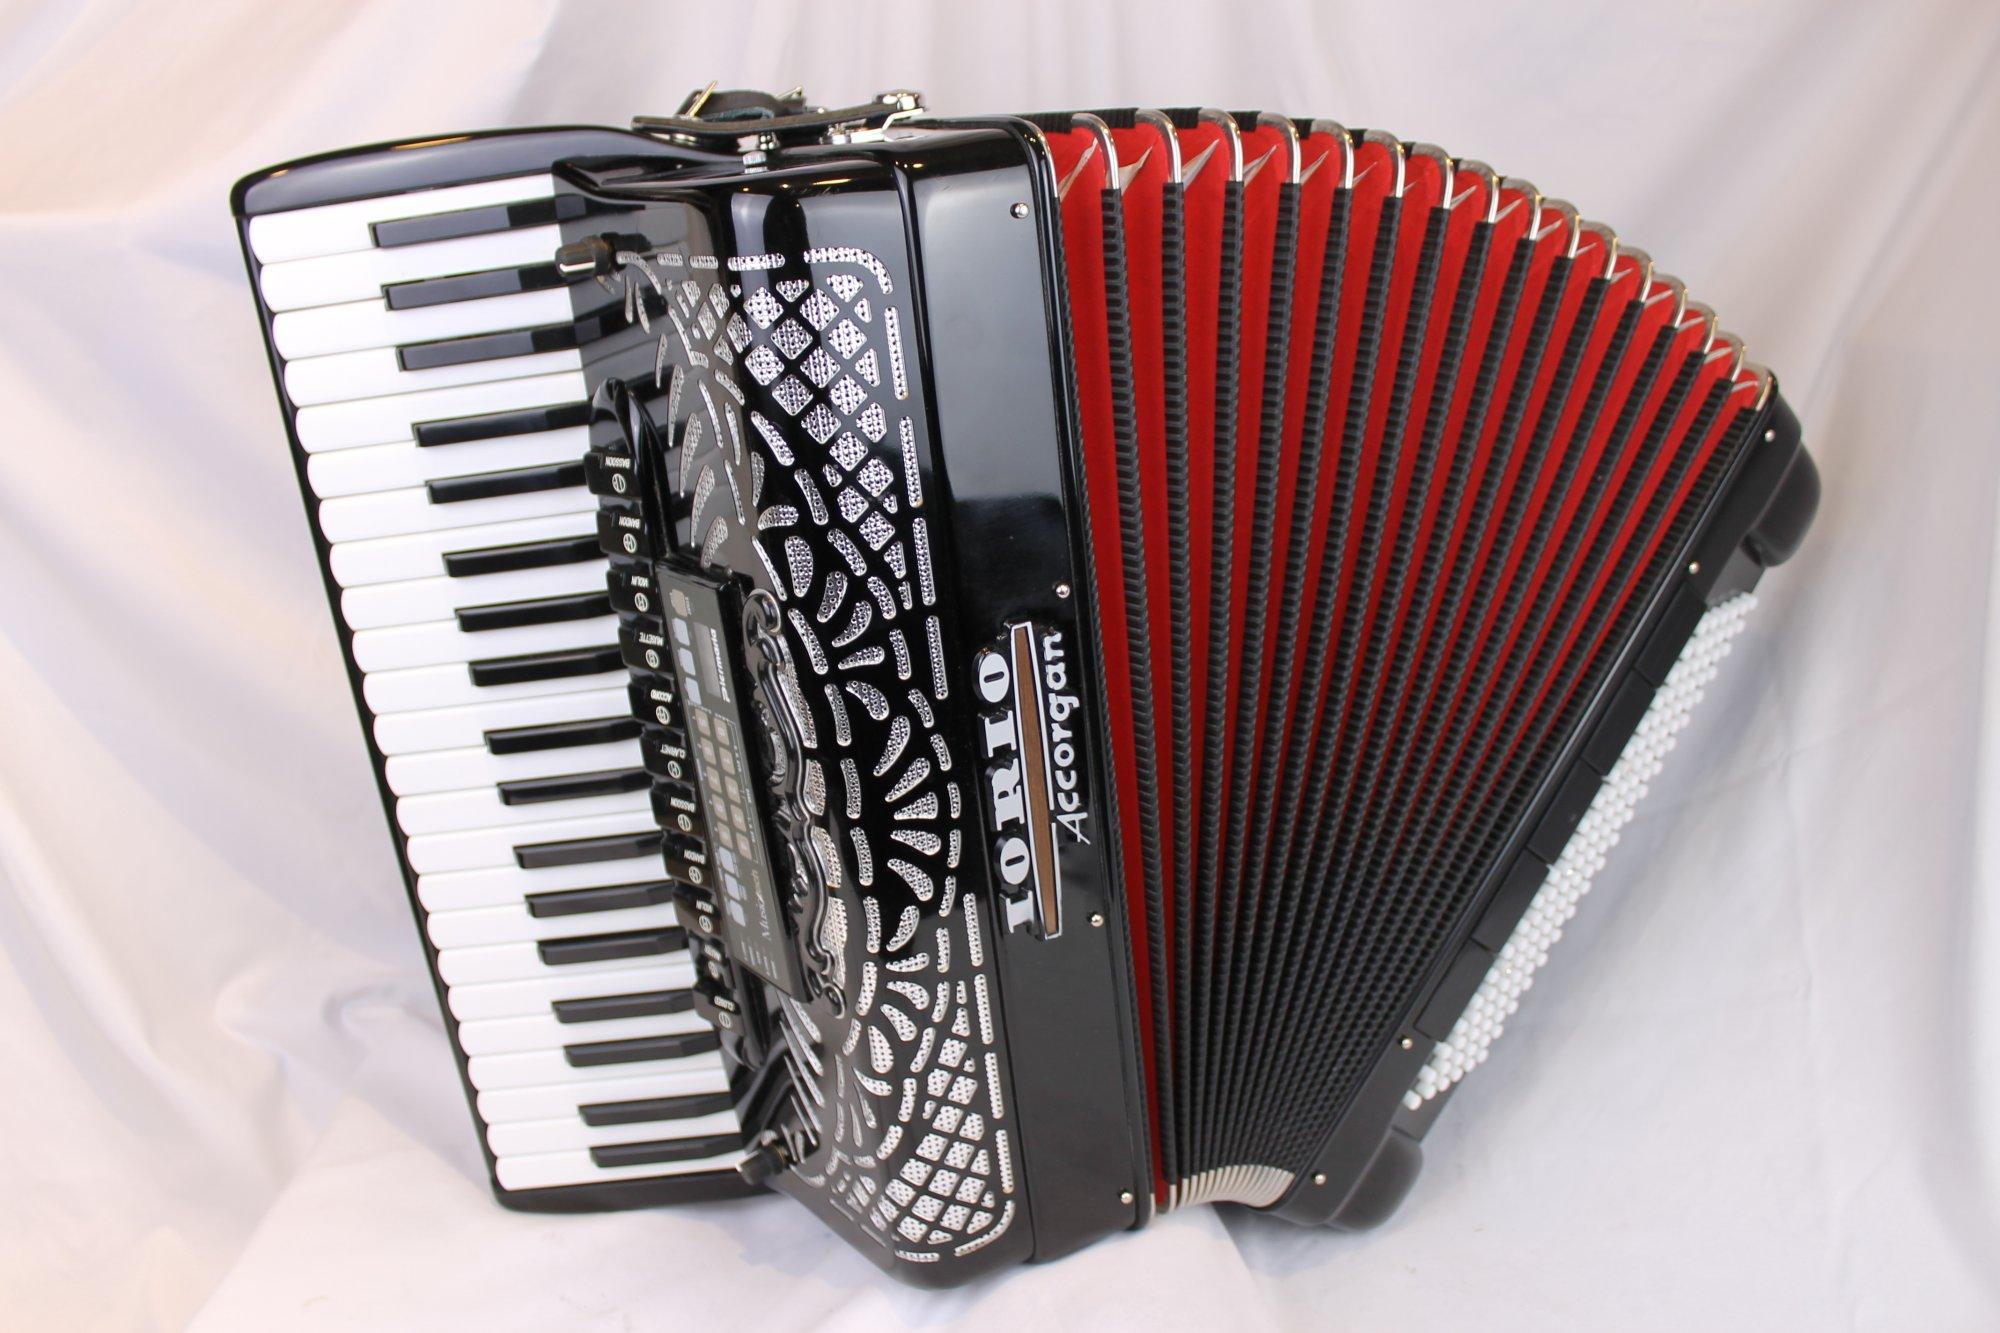 3941 - Black Iorio K Series Accorgan Model 411 Piano Accordion LMMM 41 120